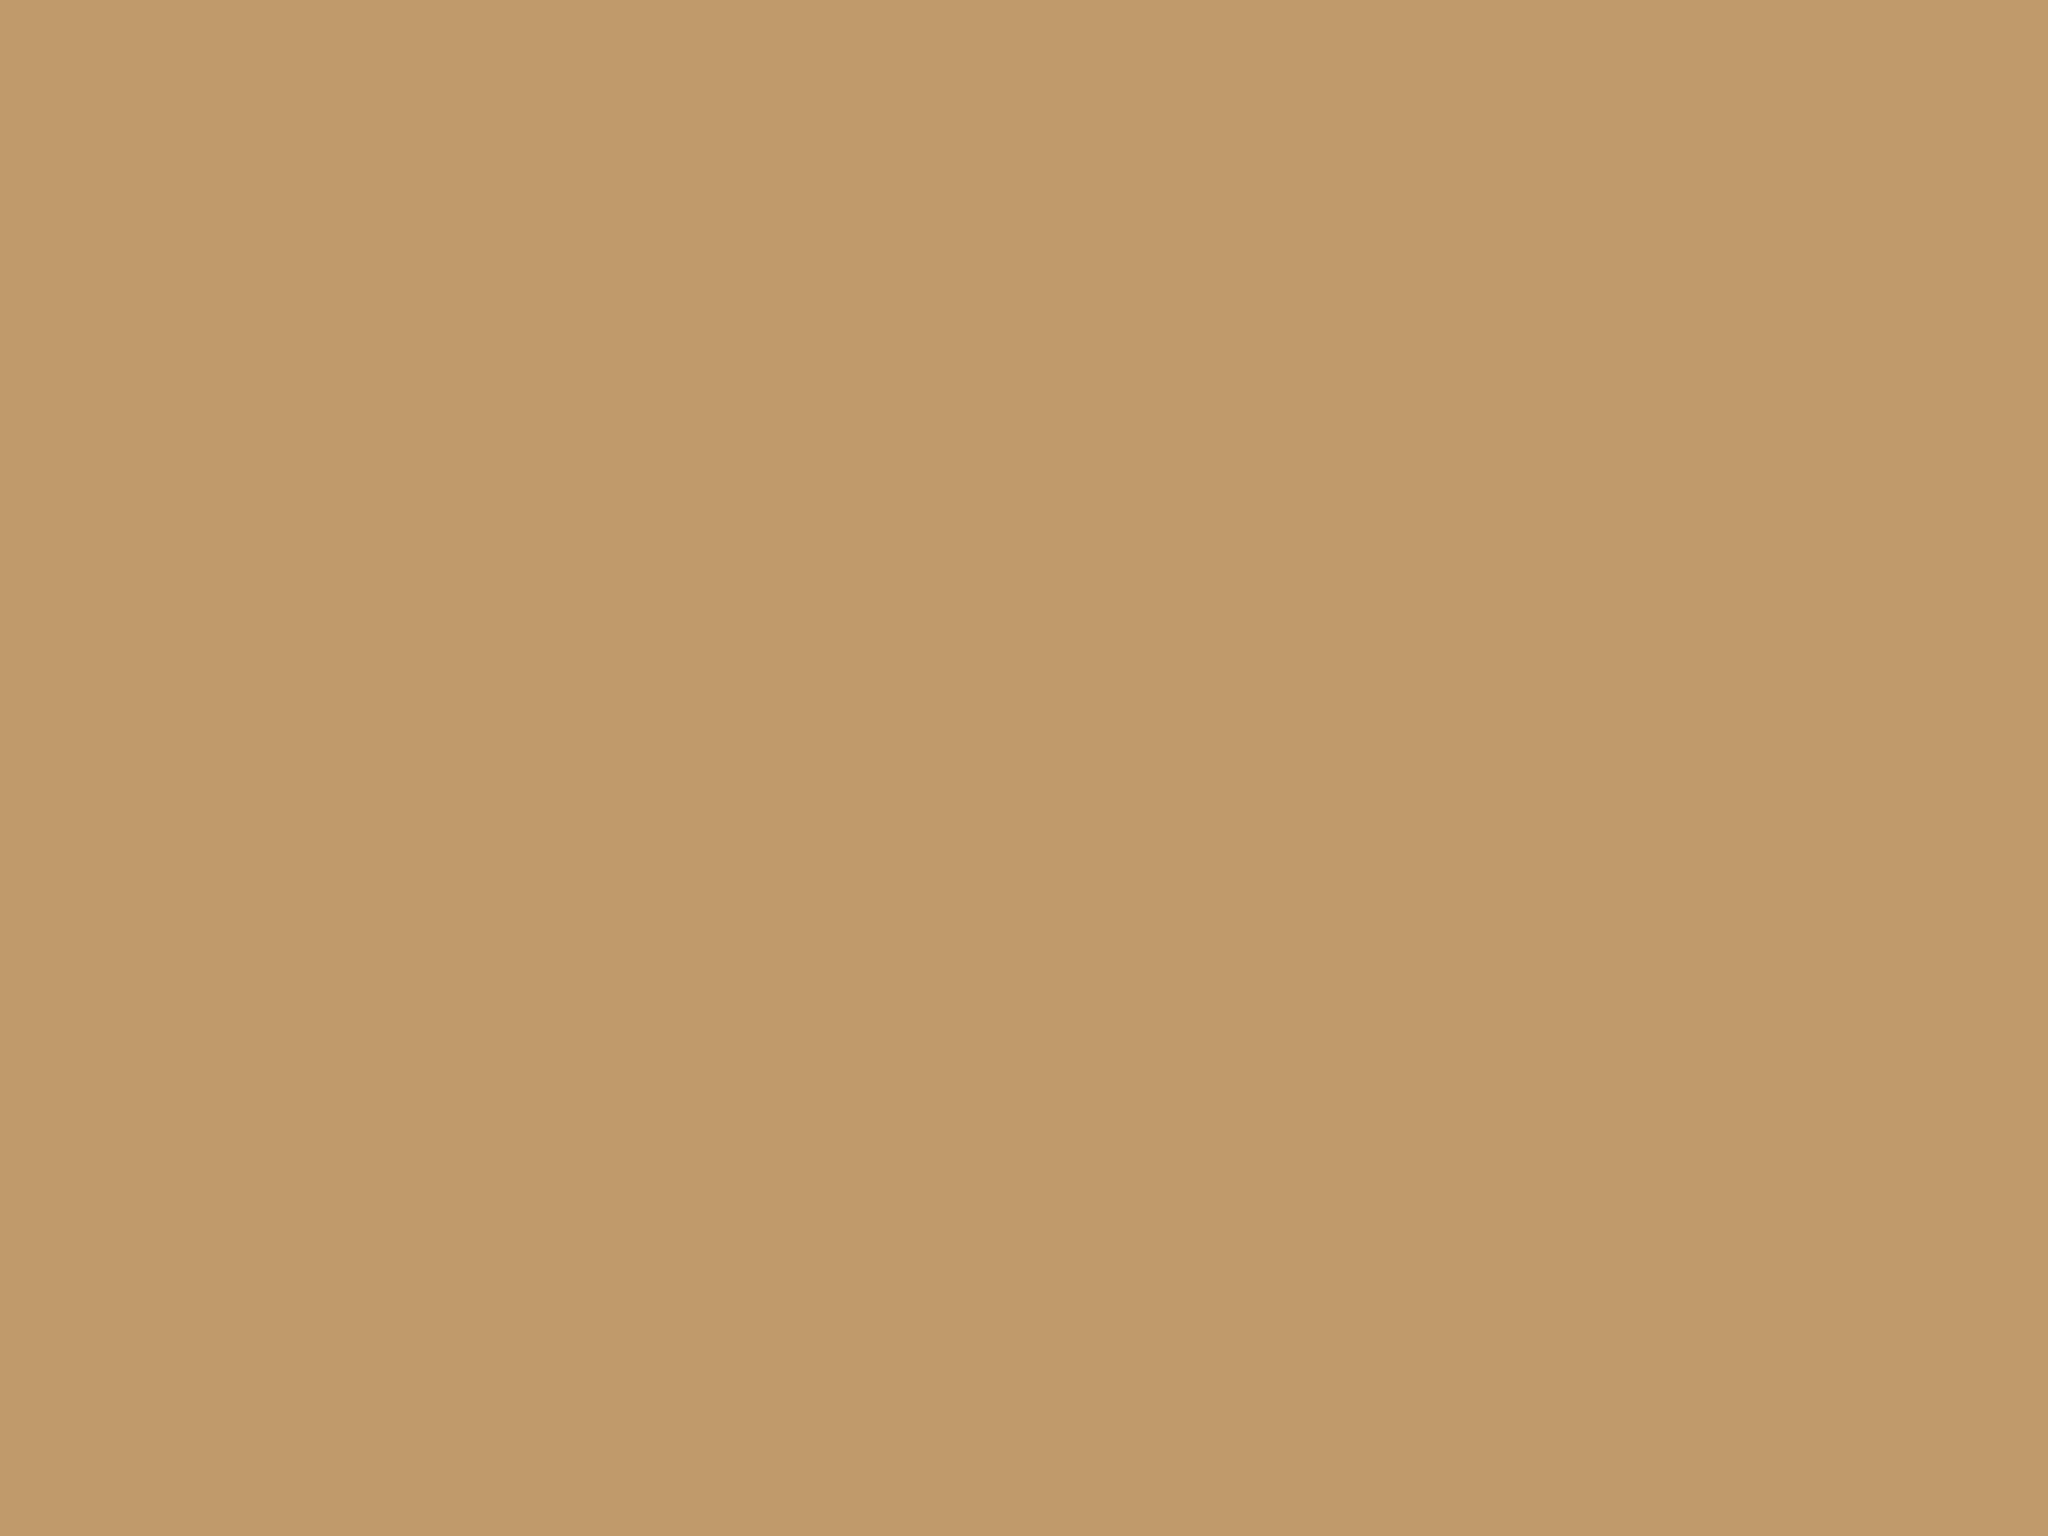 2048x1536 Desert Solid Color Background